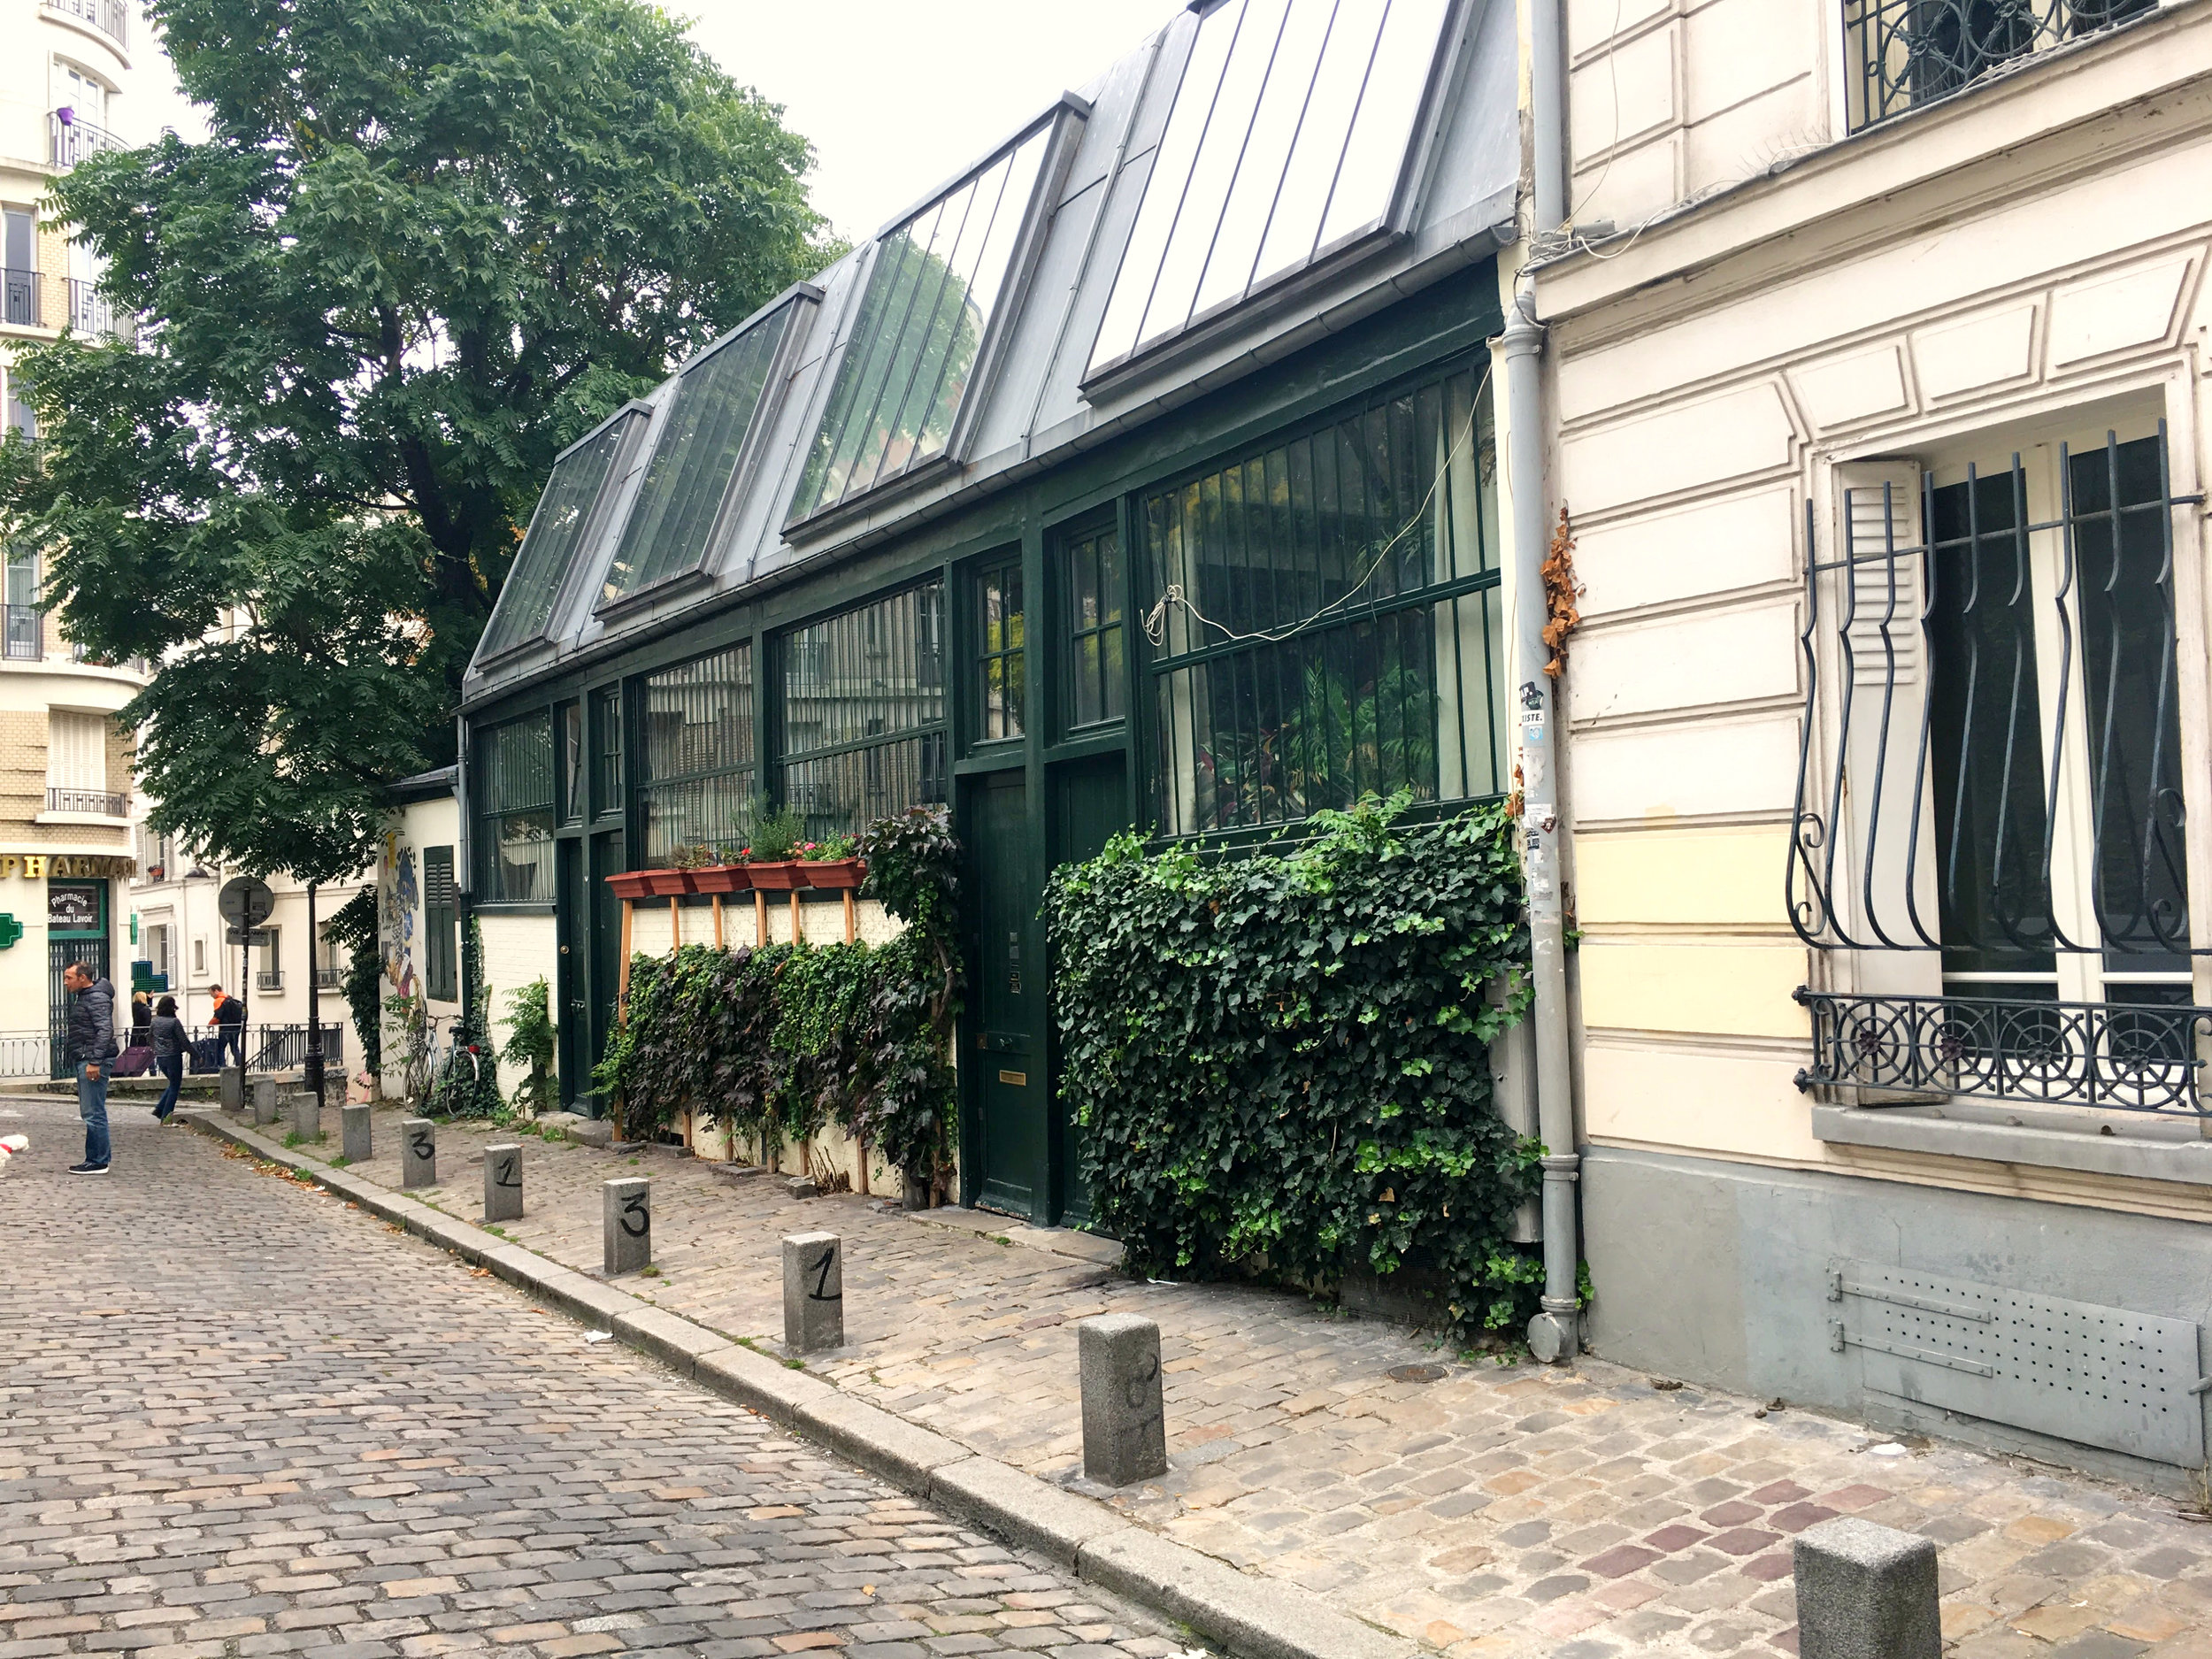 visita montmartre paris guia.jpg